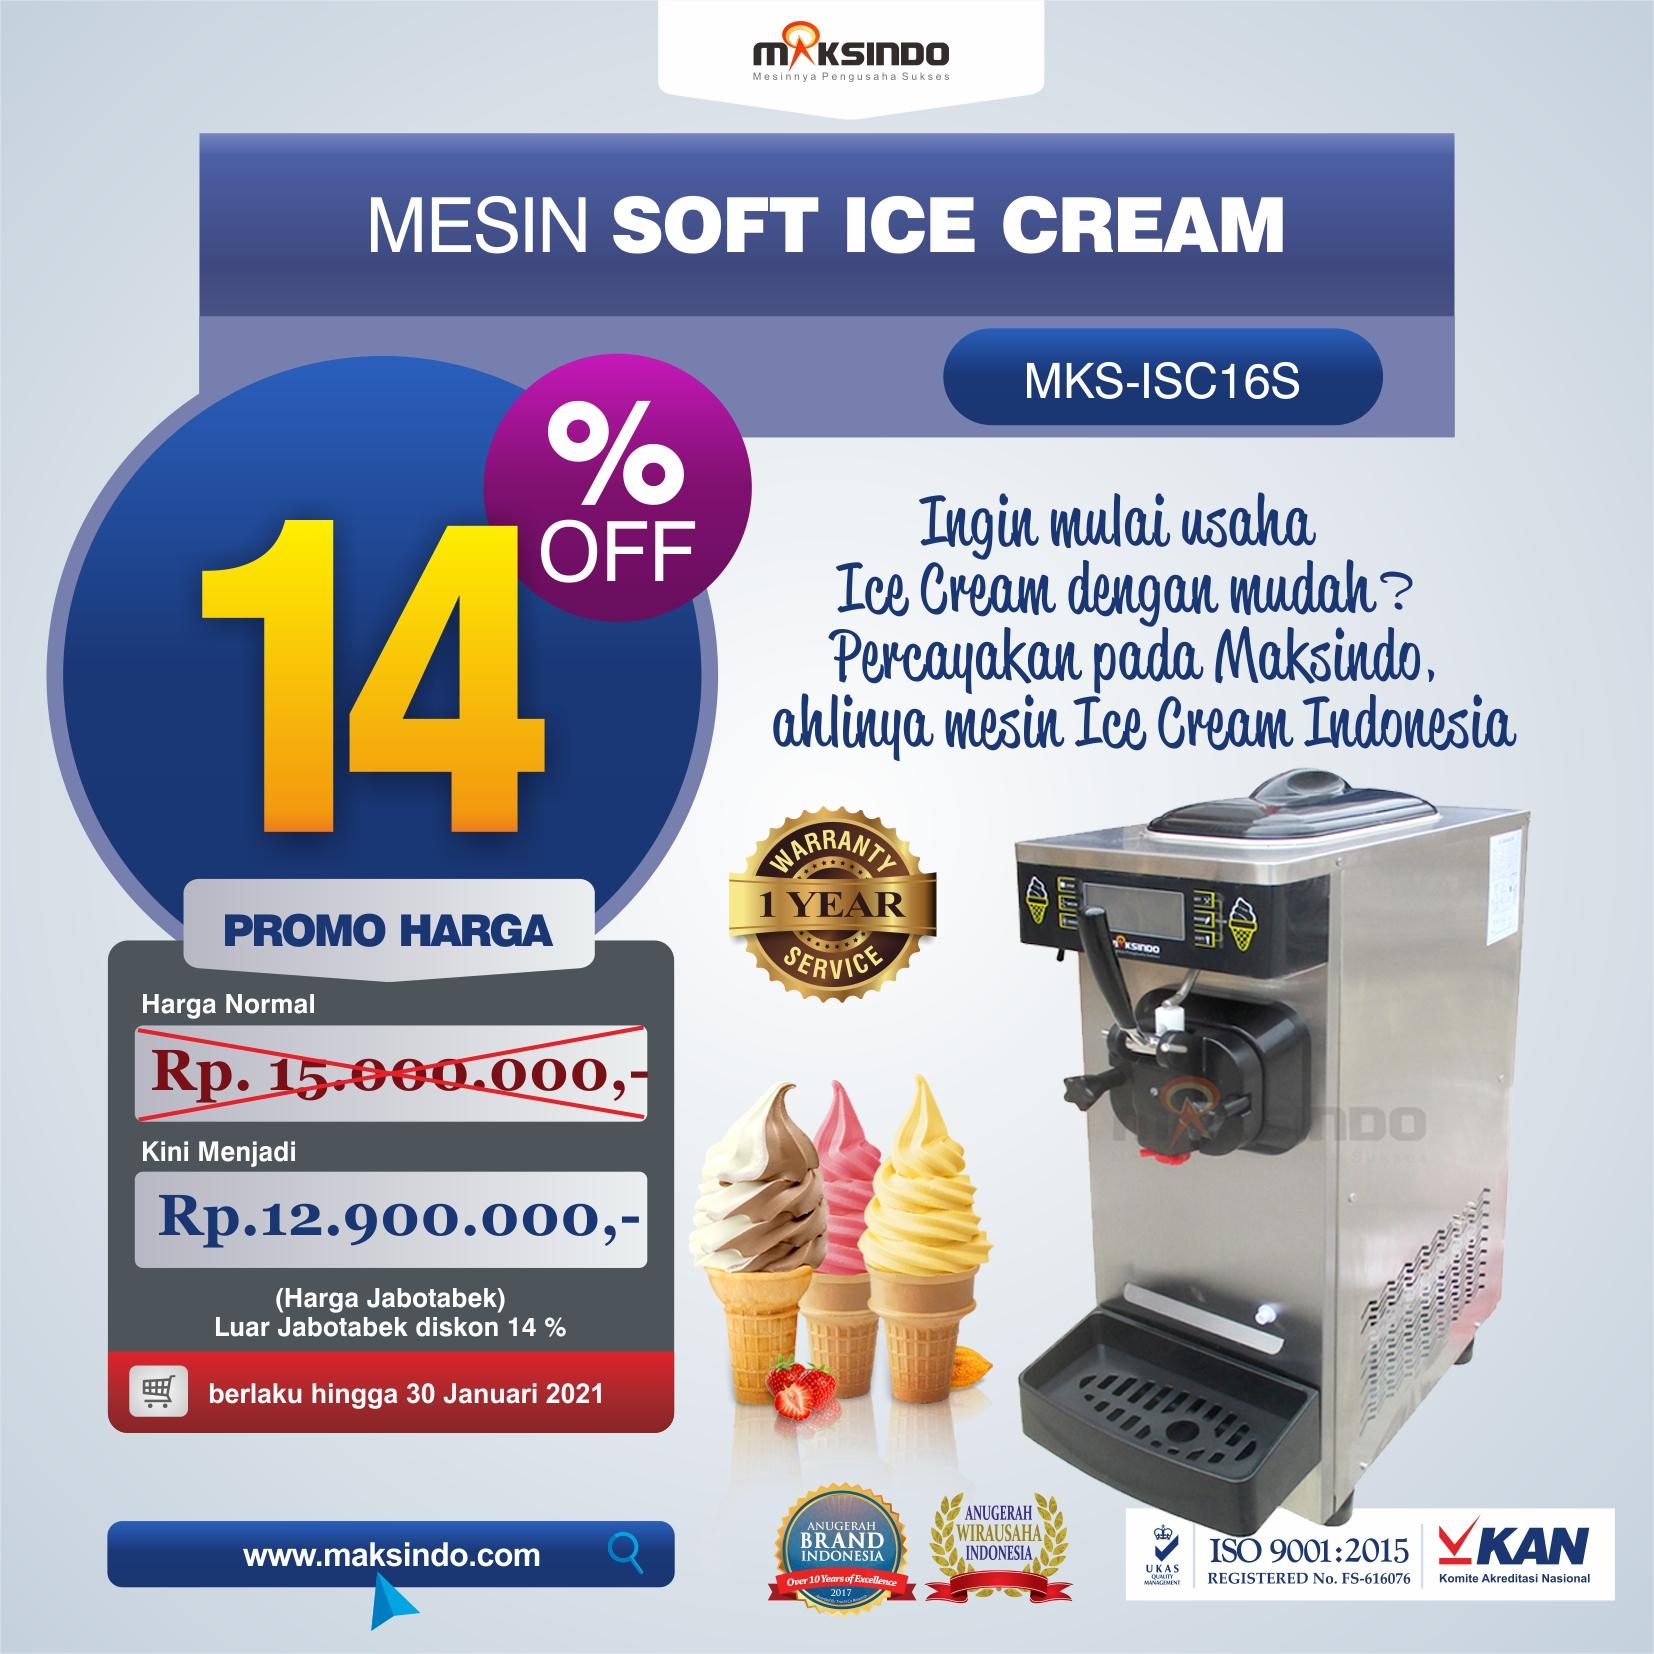 Jual Mesin Soft Ice Cream ISC-16S di Medan